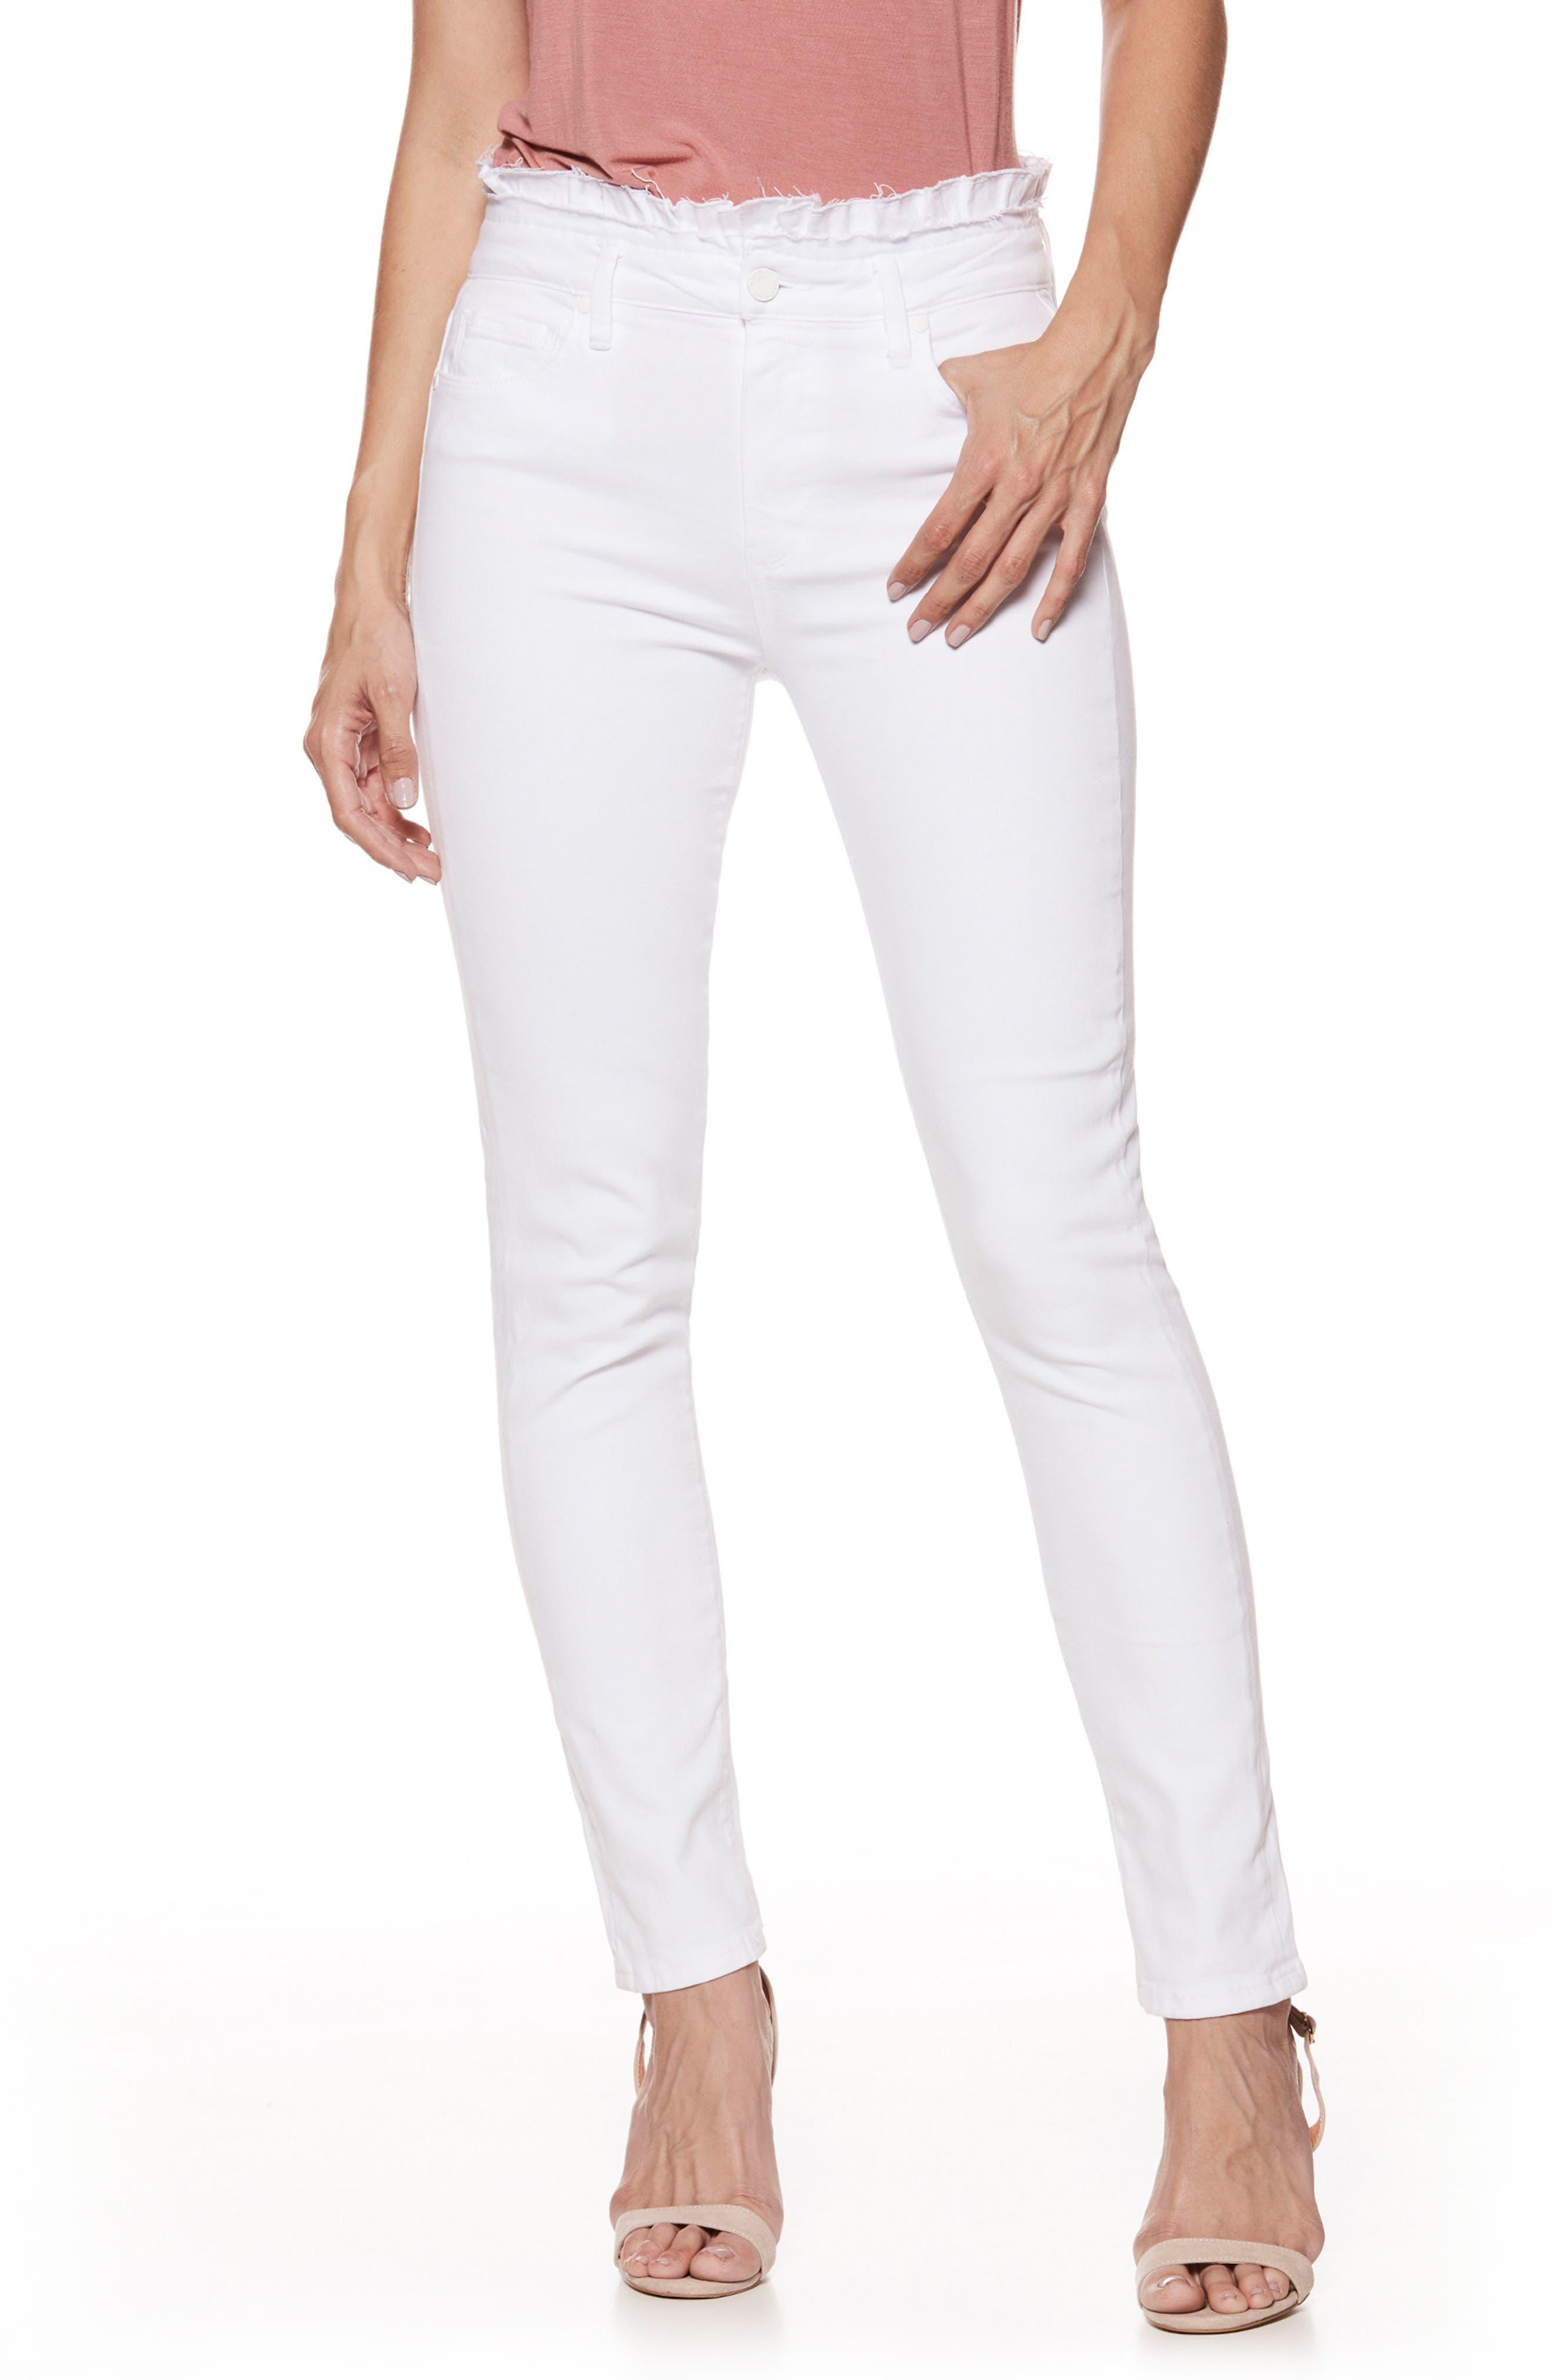 Hoxton Ruffle High Waist Ankle Ultra Skinny Jeans,                         Main,                         color, CRISP WHITE